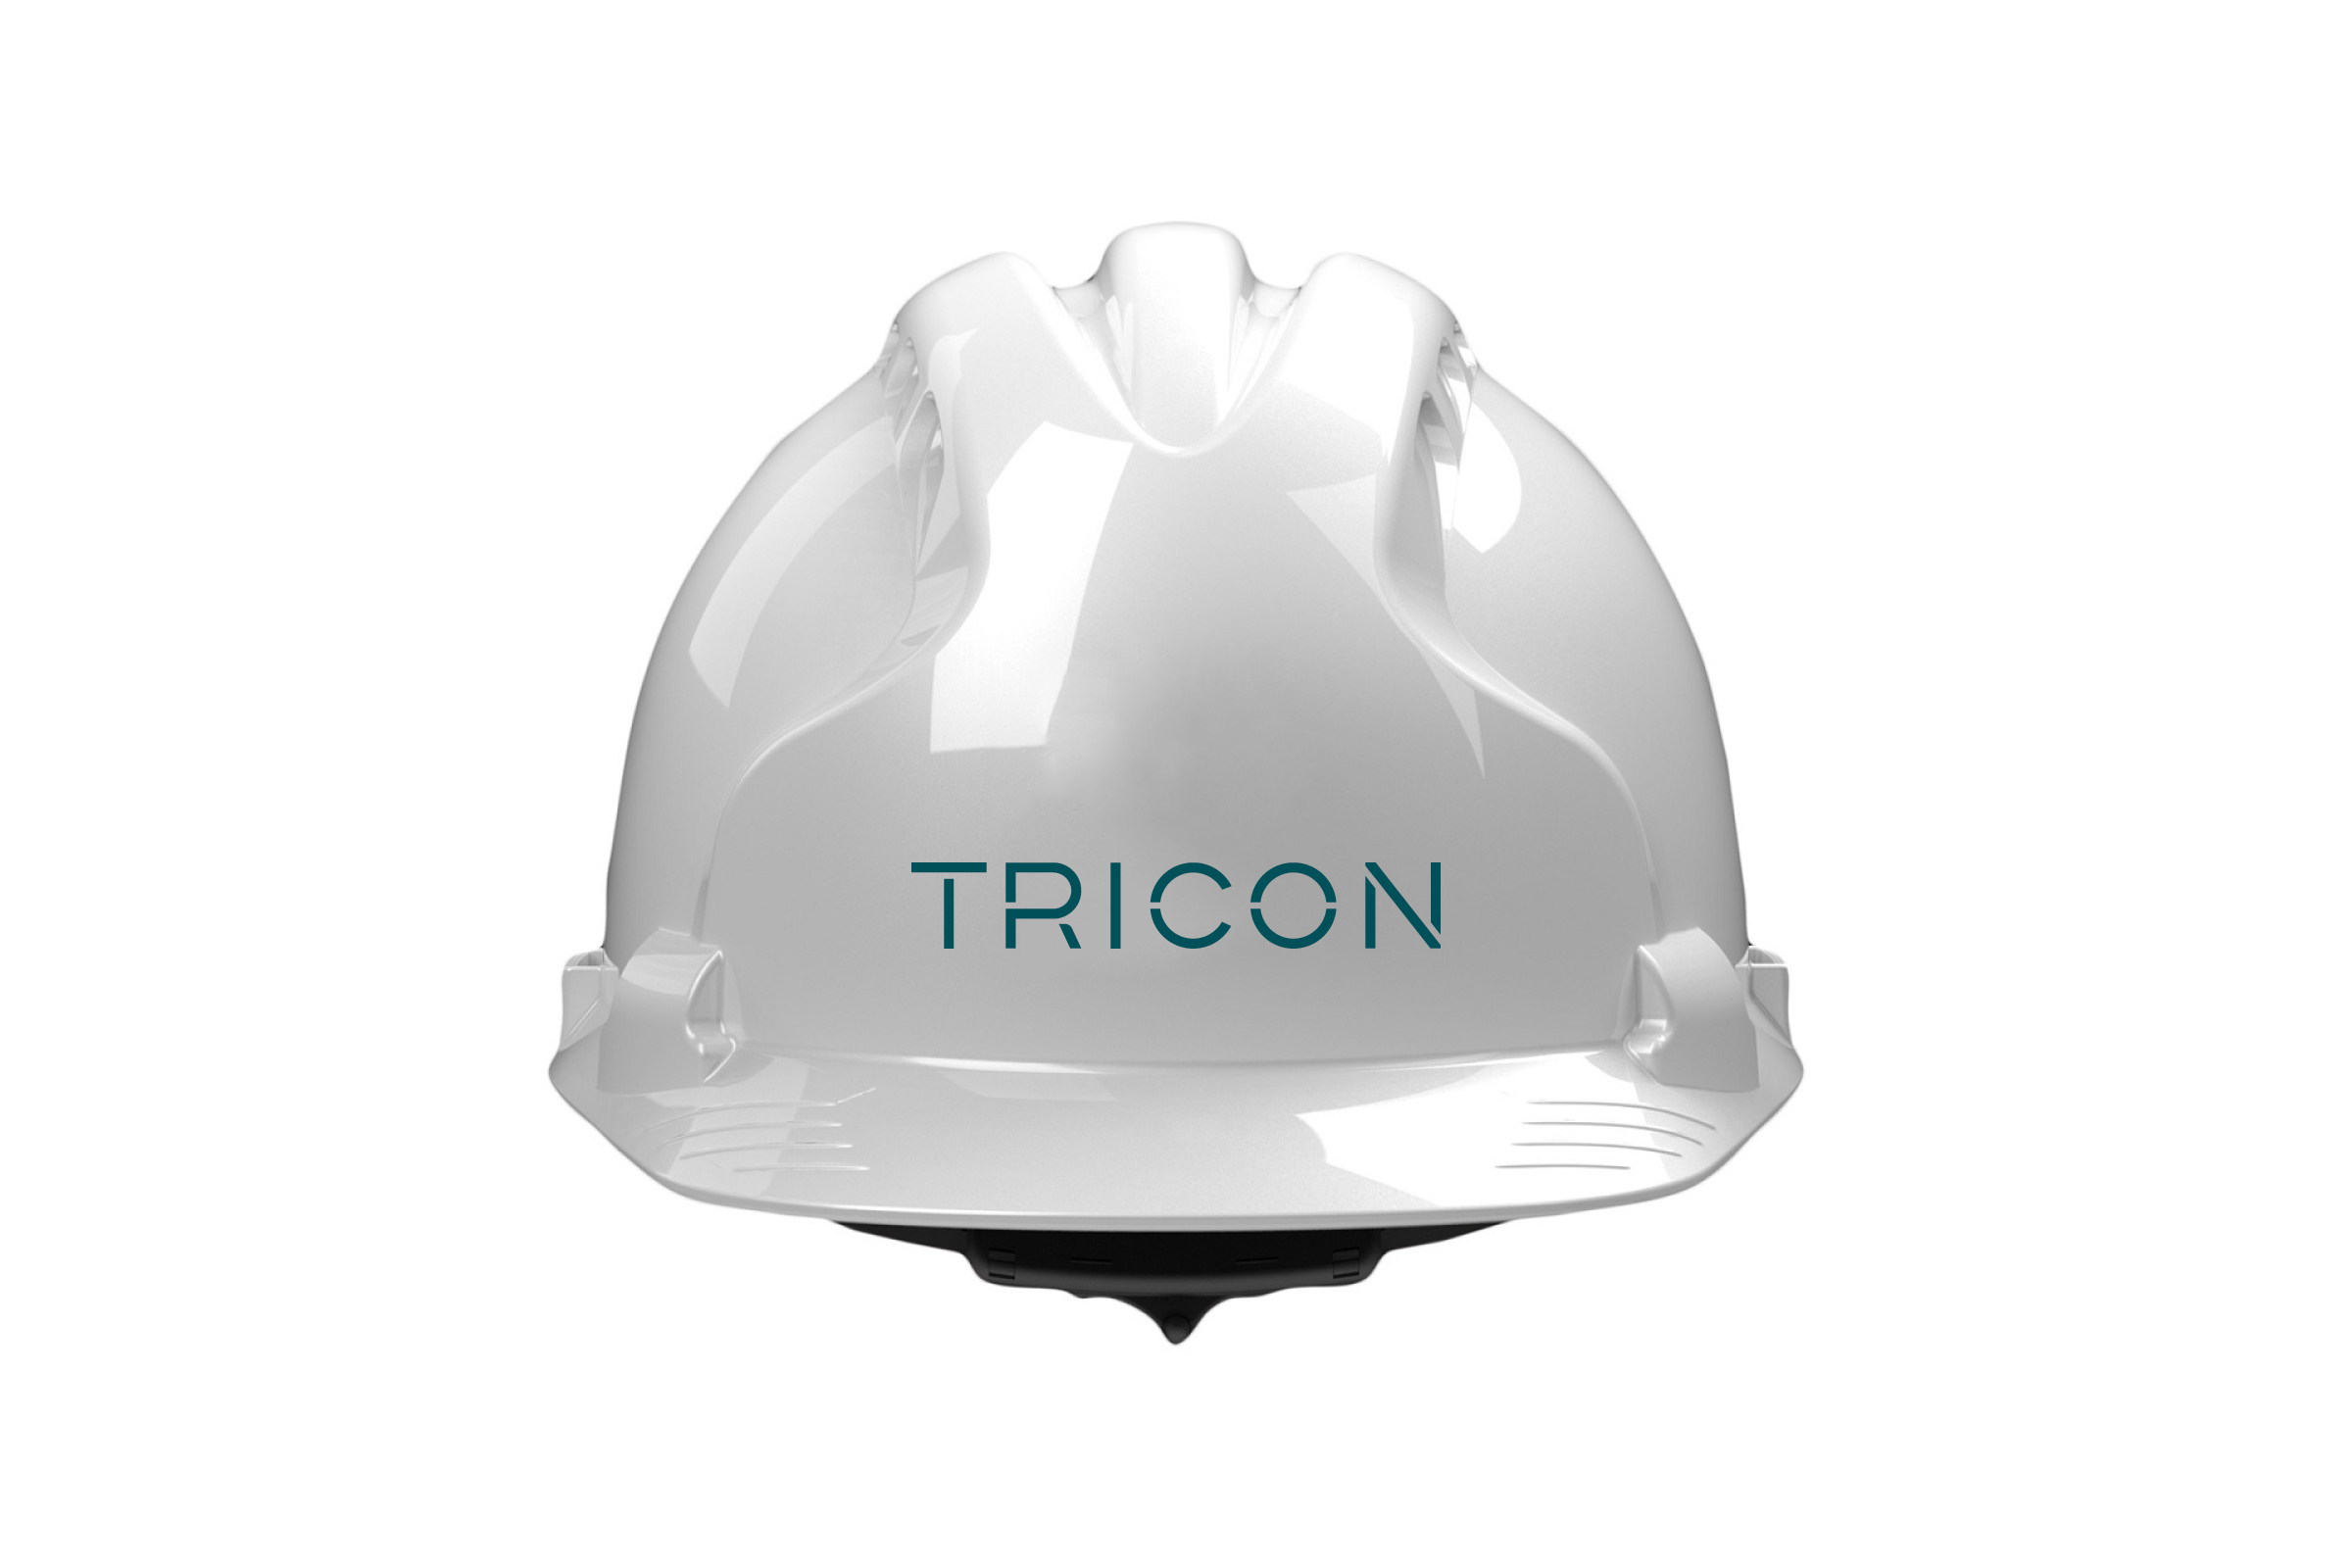 Tricon-07.jpg